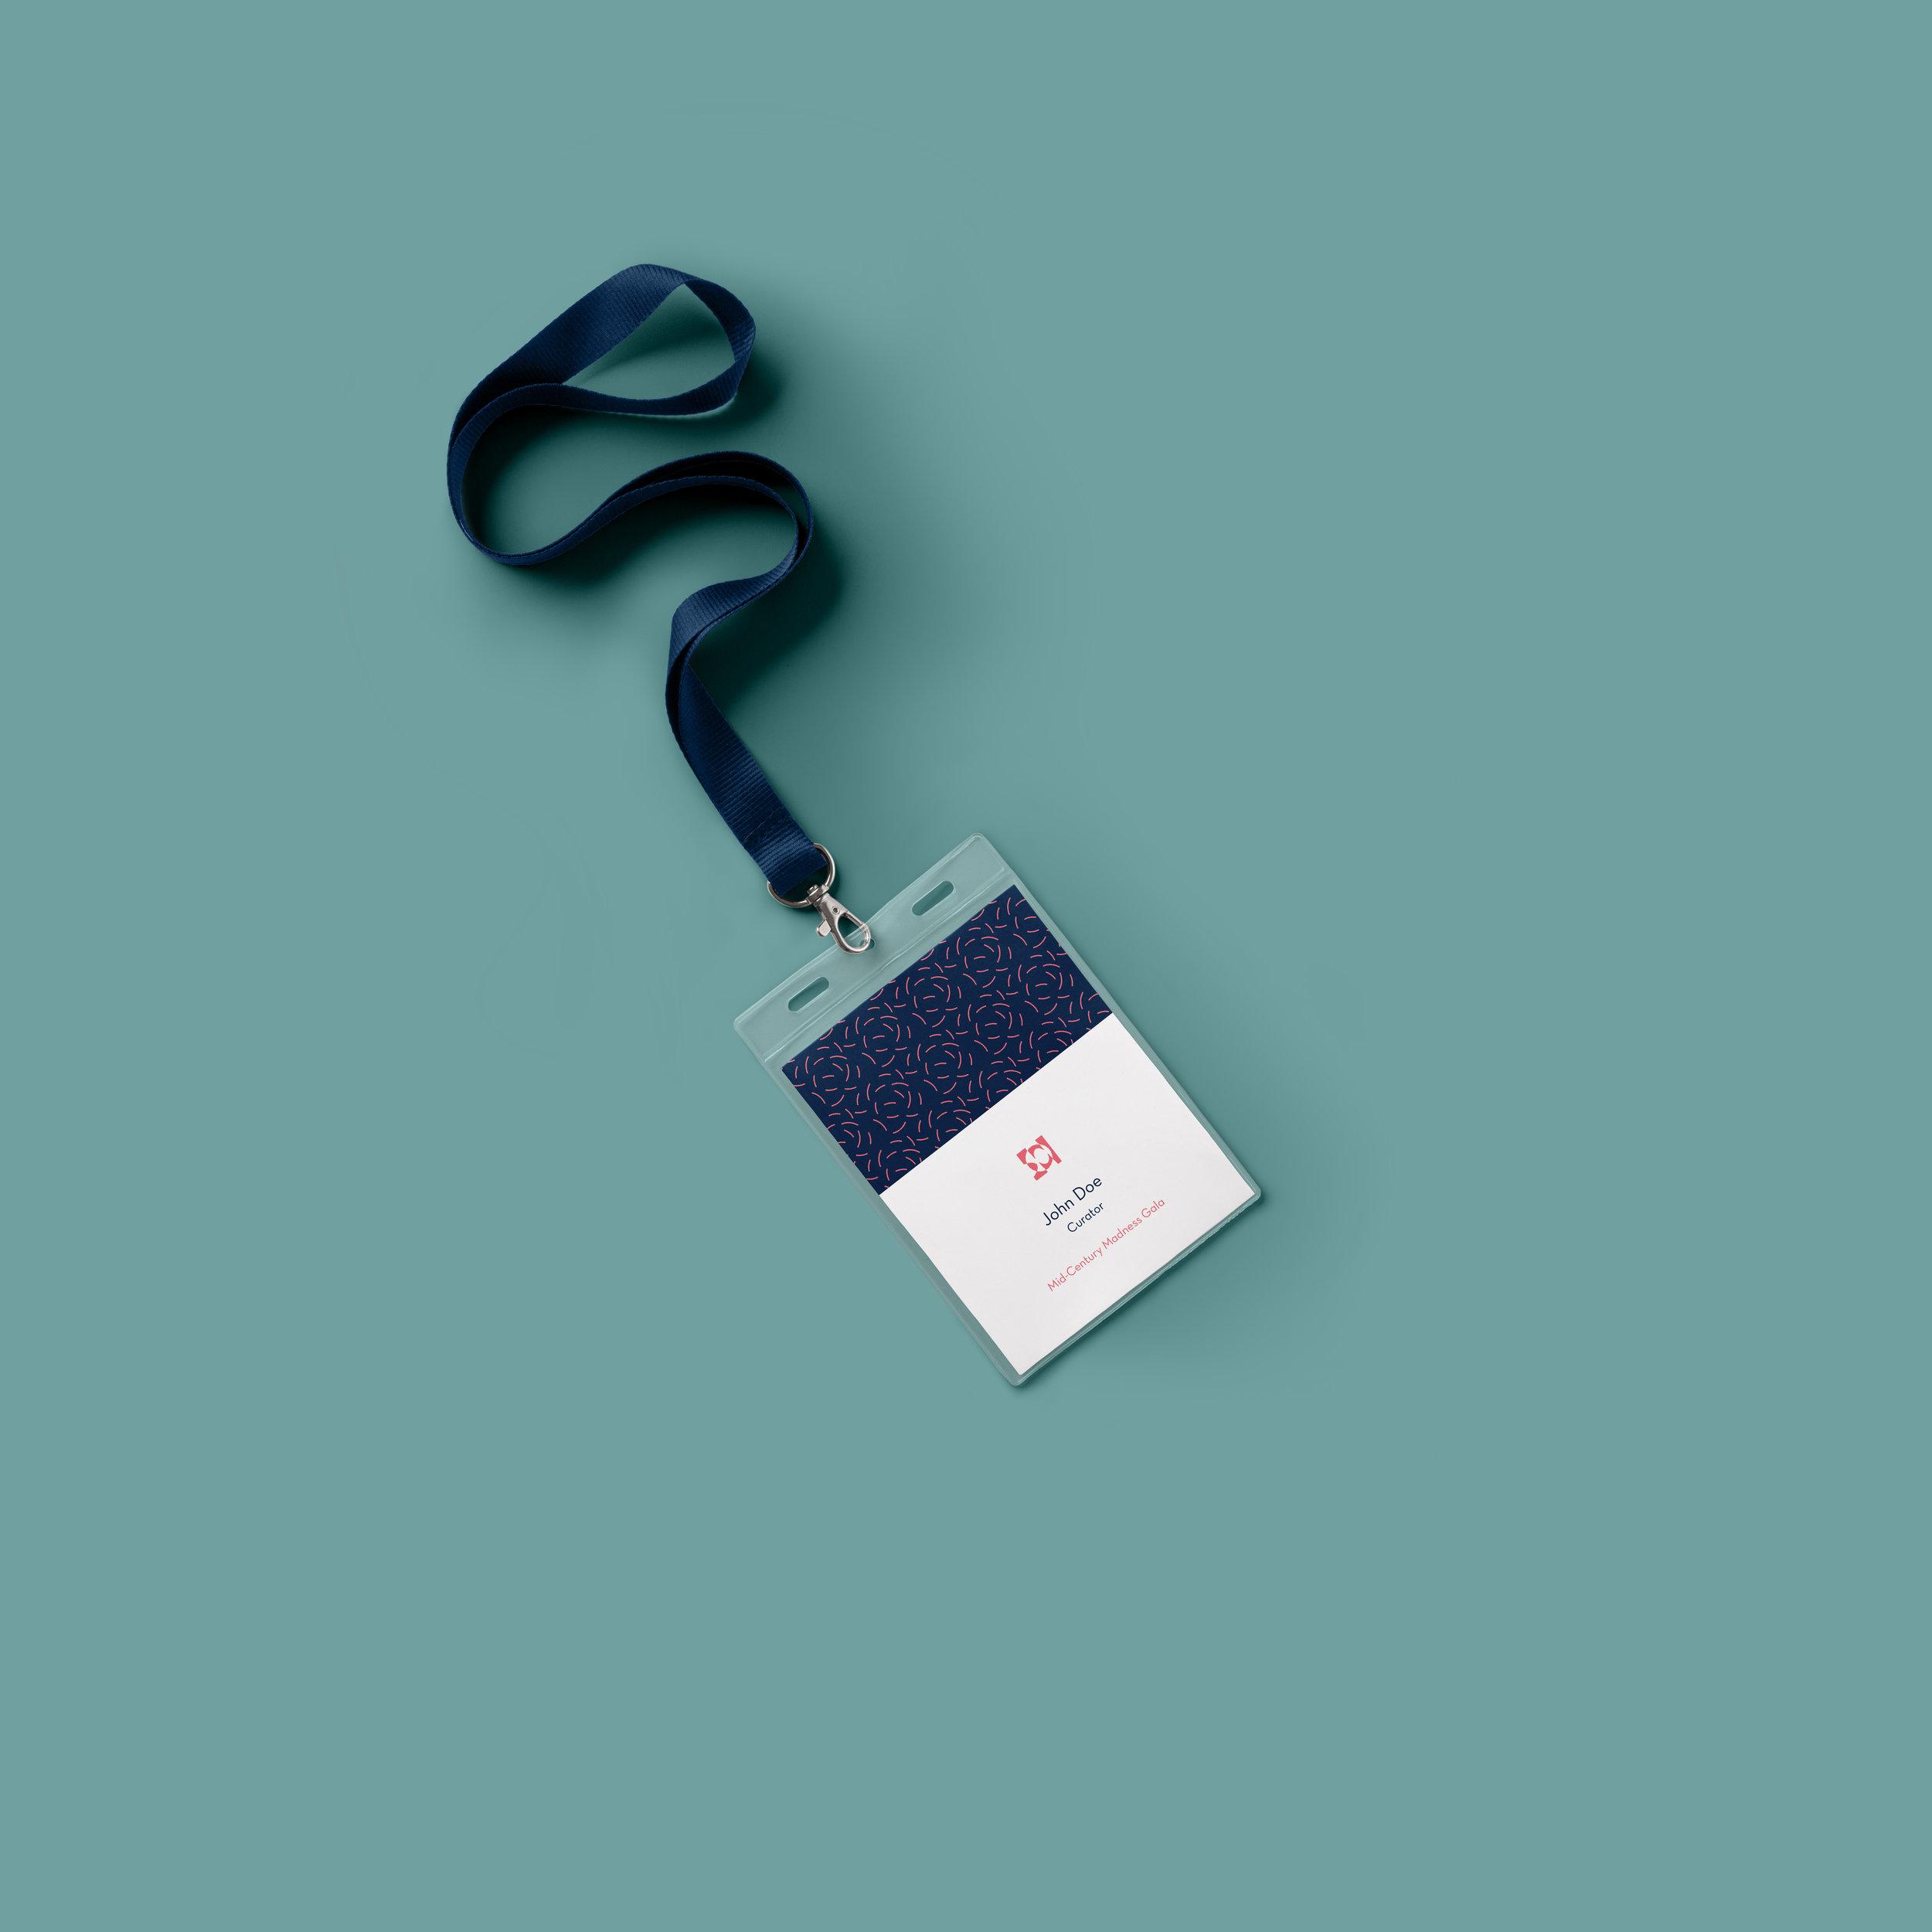 ID-Card-Holder-Mockup-vol-4.jpg